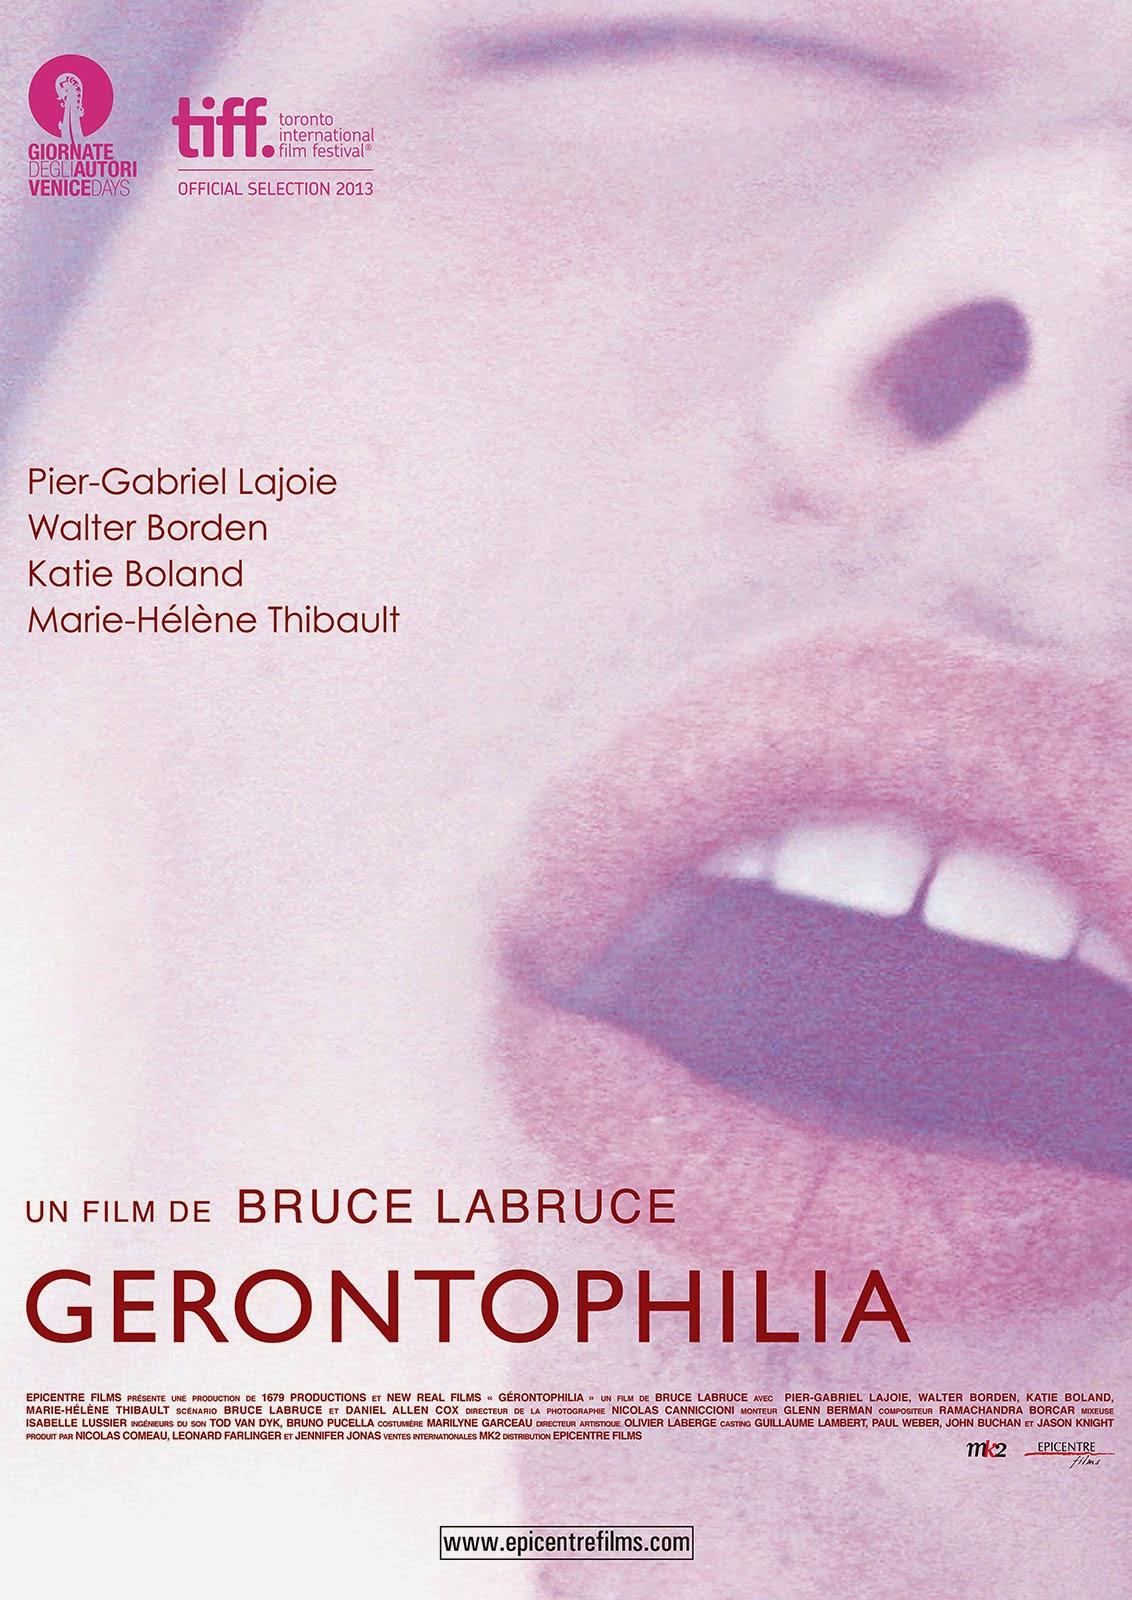 Gerontophilia (16/11/2014)